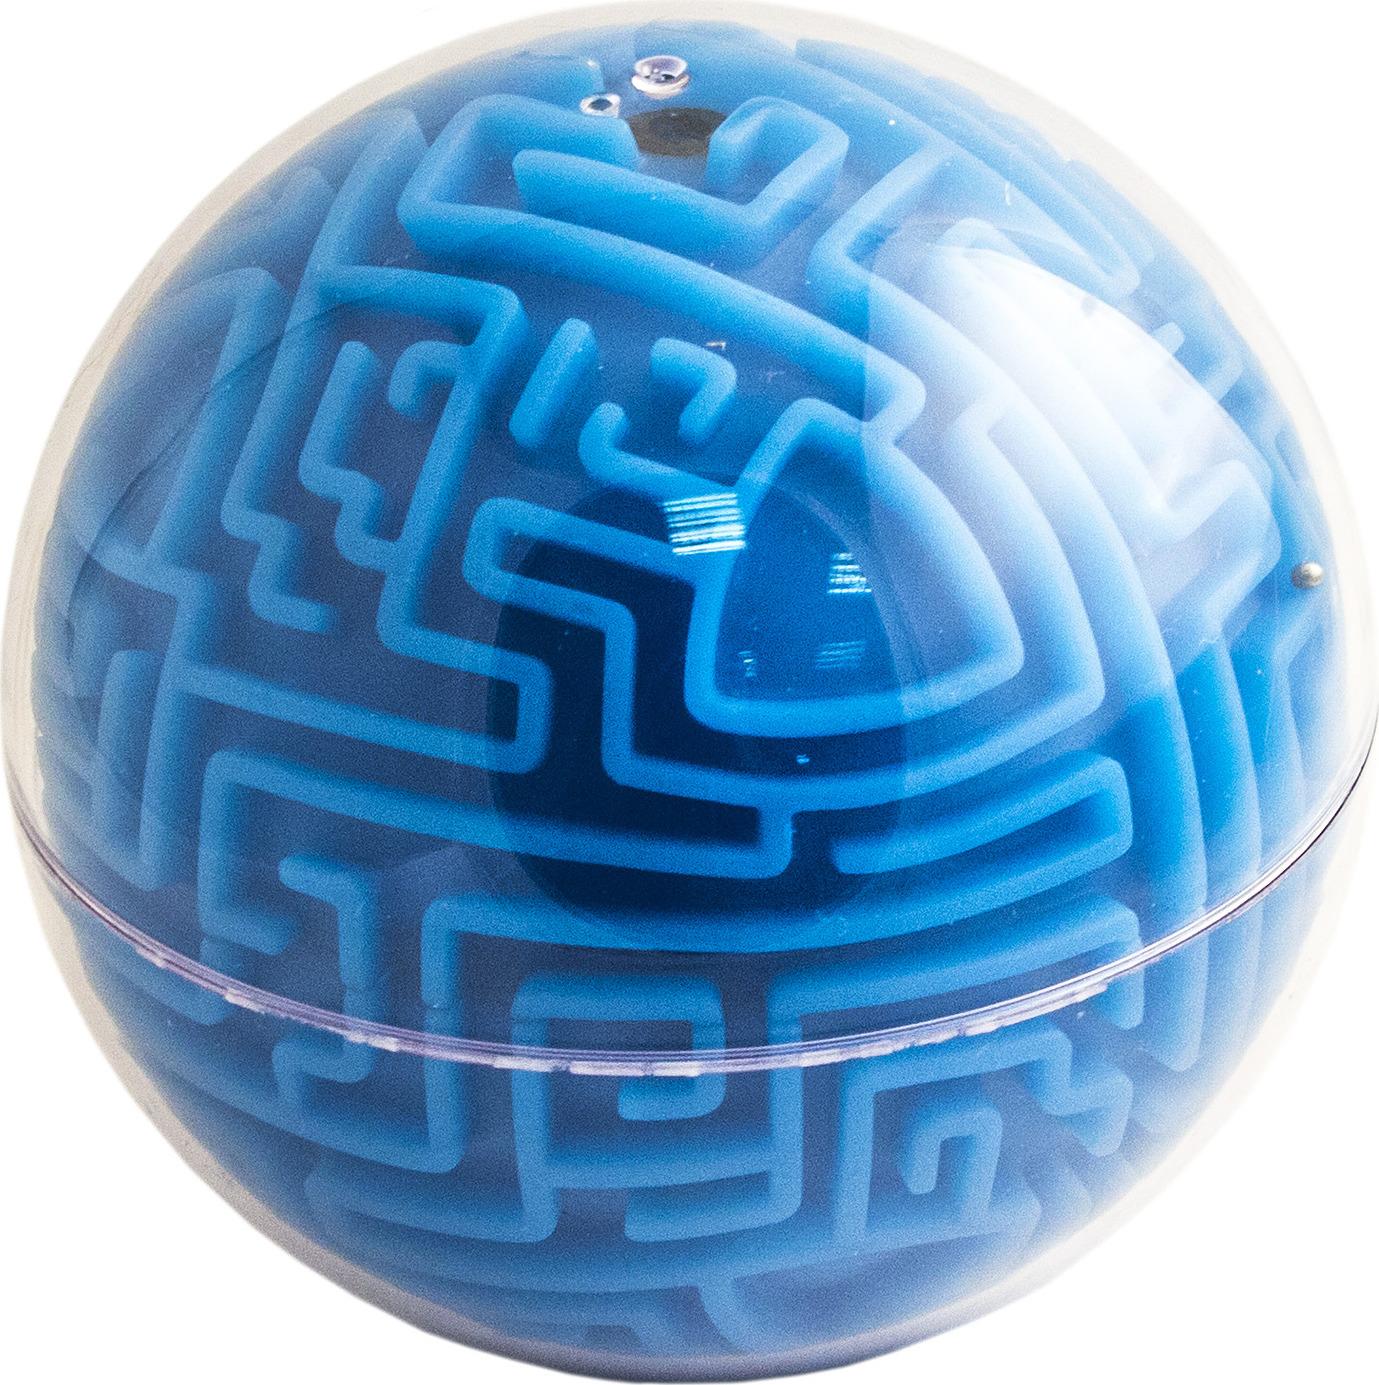 Головоломка-лабиринт Эврика Сфера, цвет: синий головоломка эврика лабиринт сфера red 98723